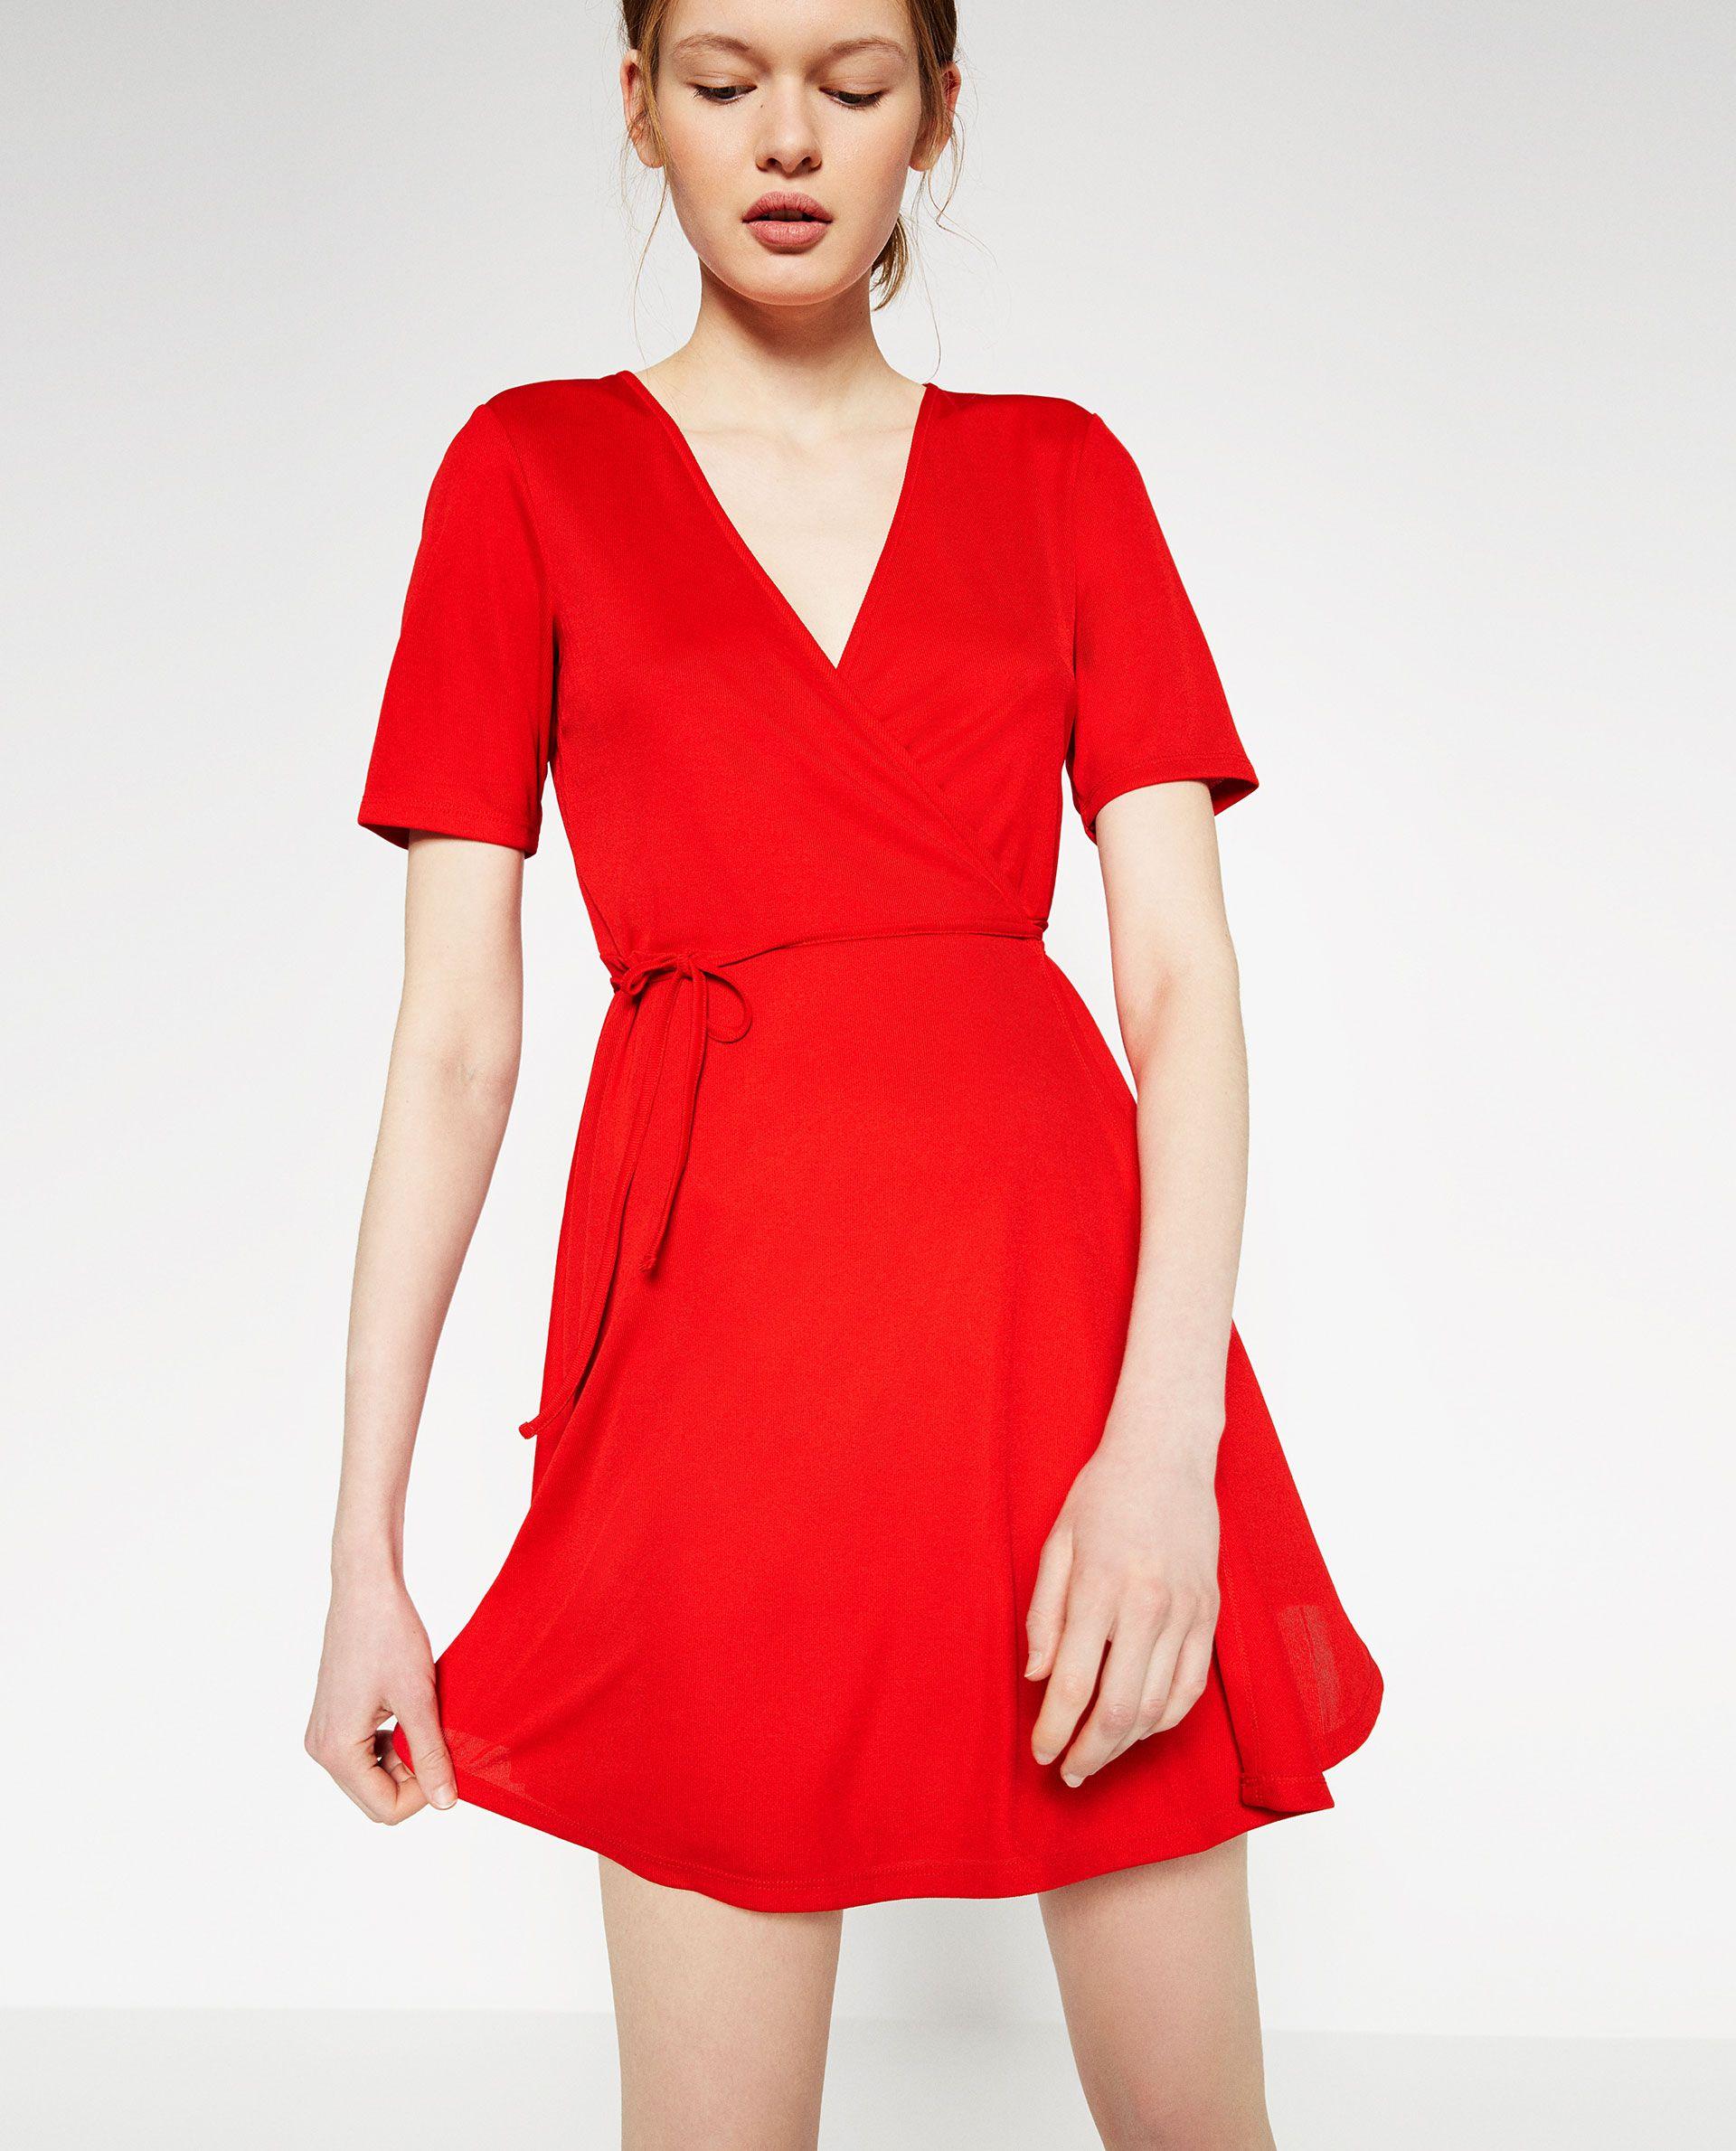 ffdbe0d244 Vestido cruzado (vermelho)  ZARA TRF (15